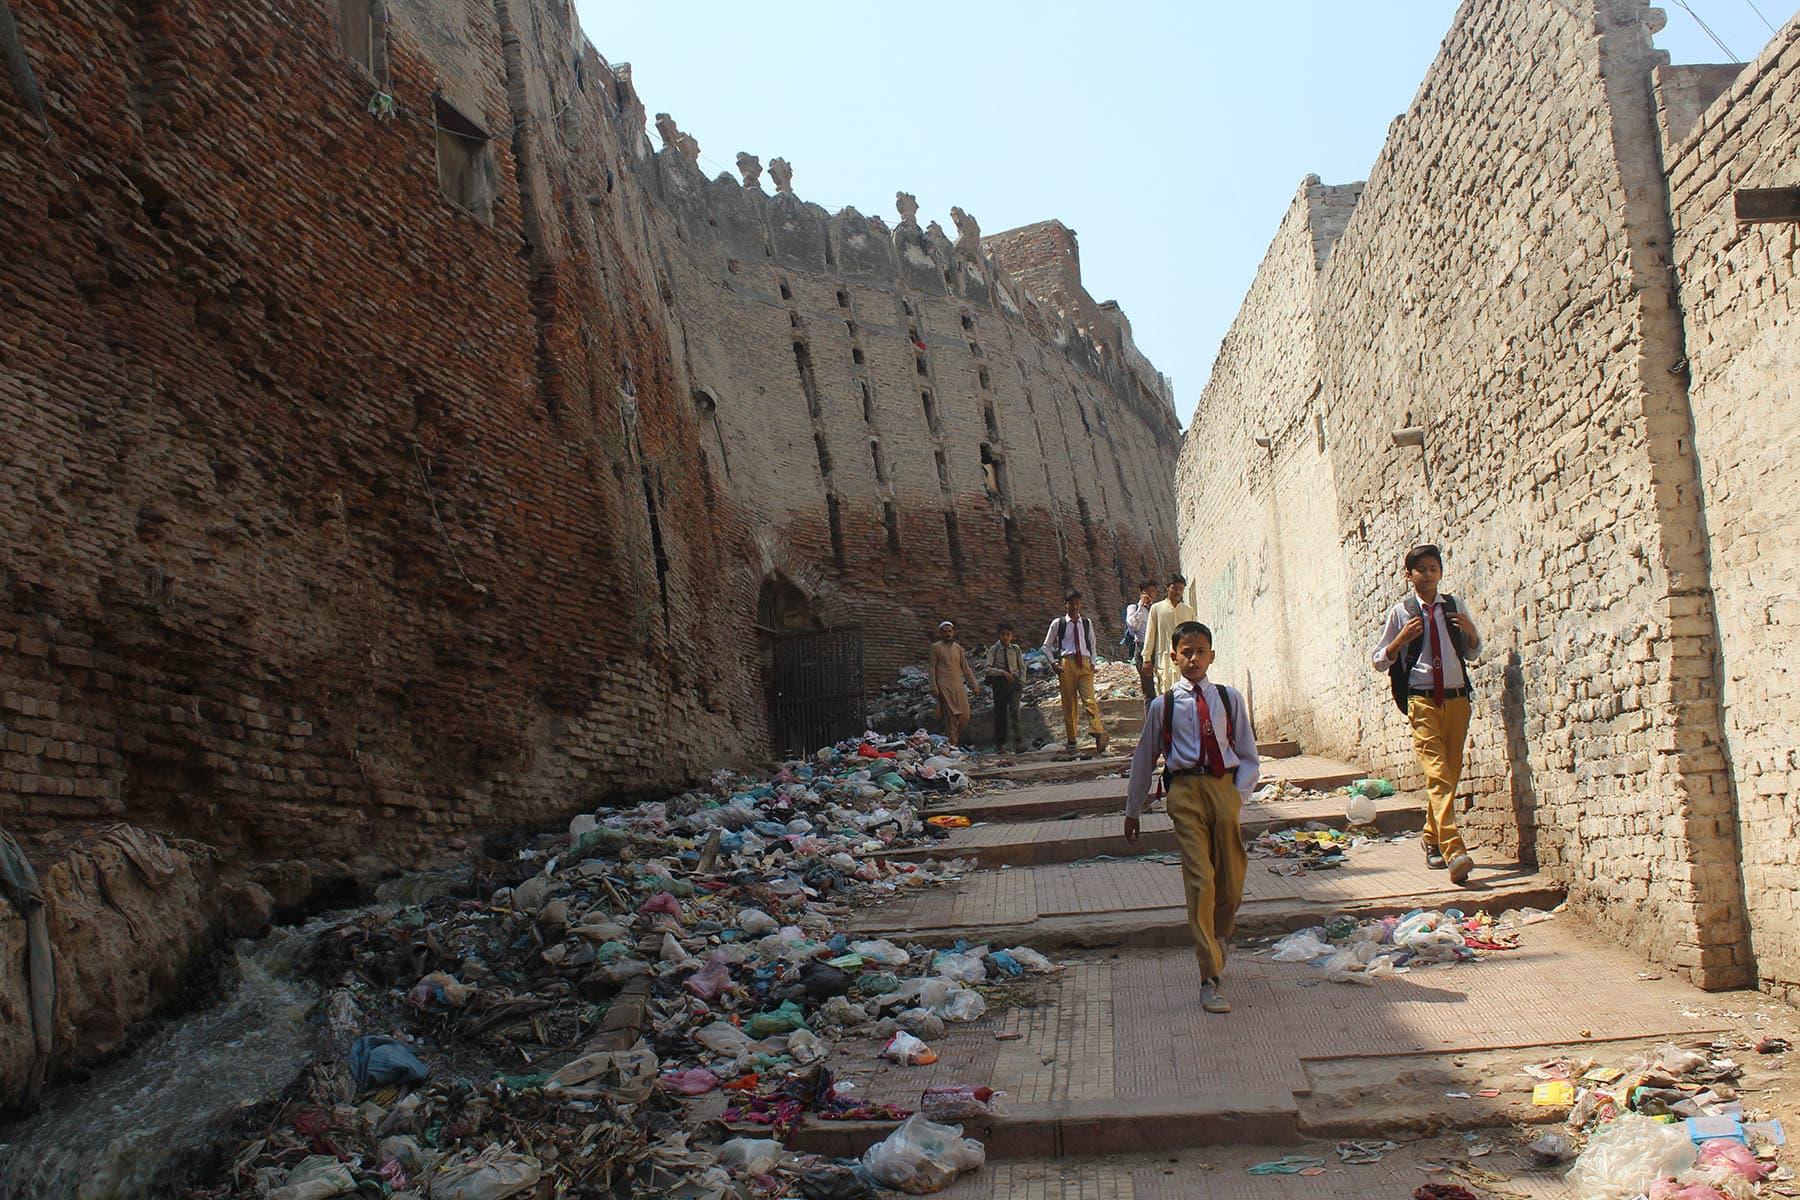 Hyderabad Fort